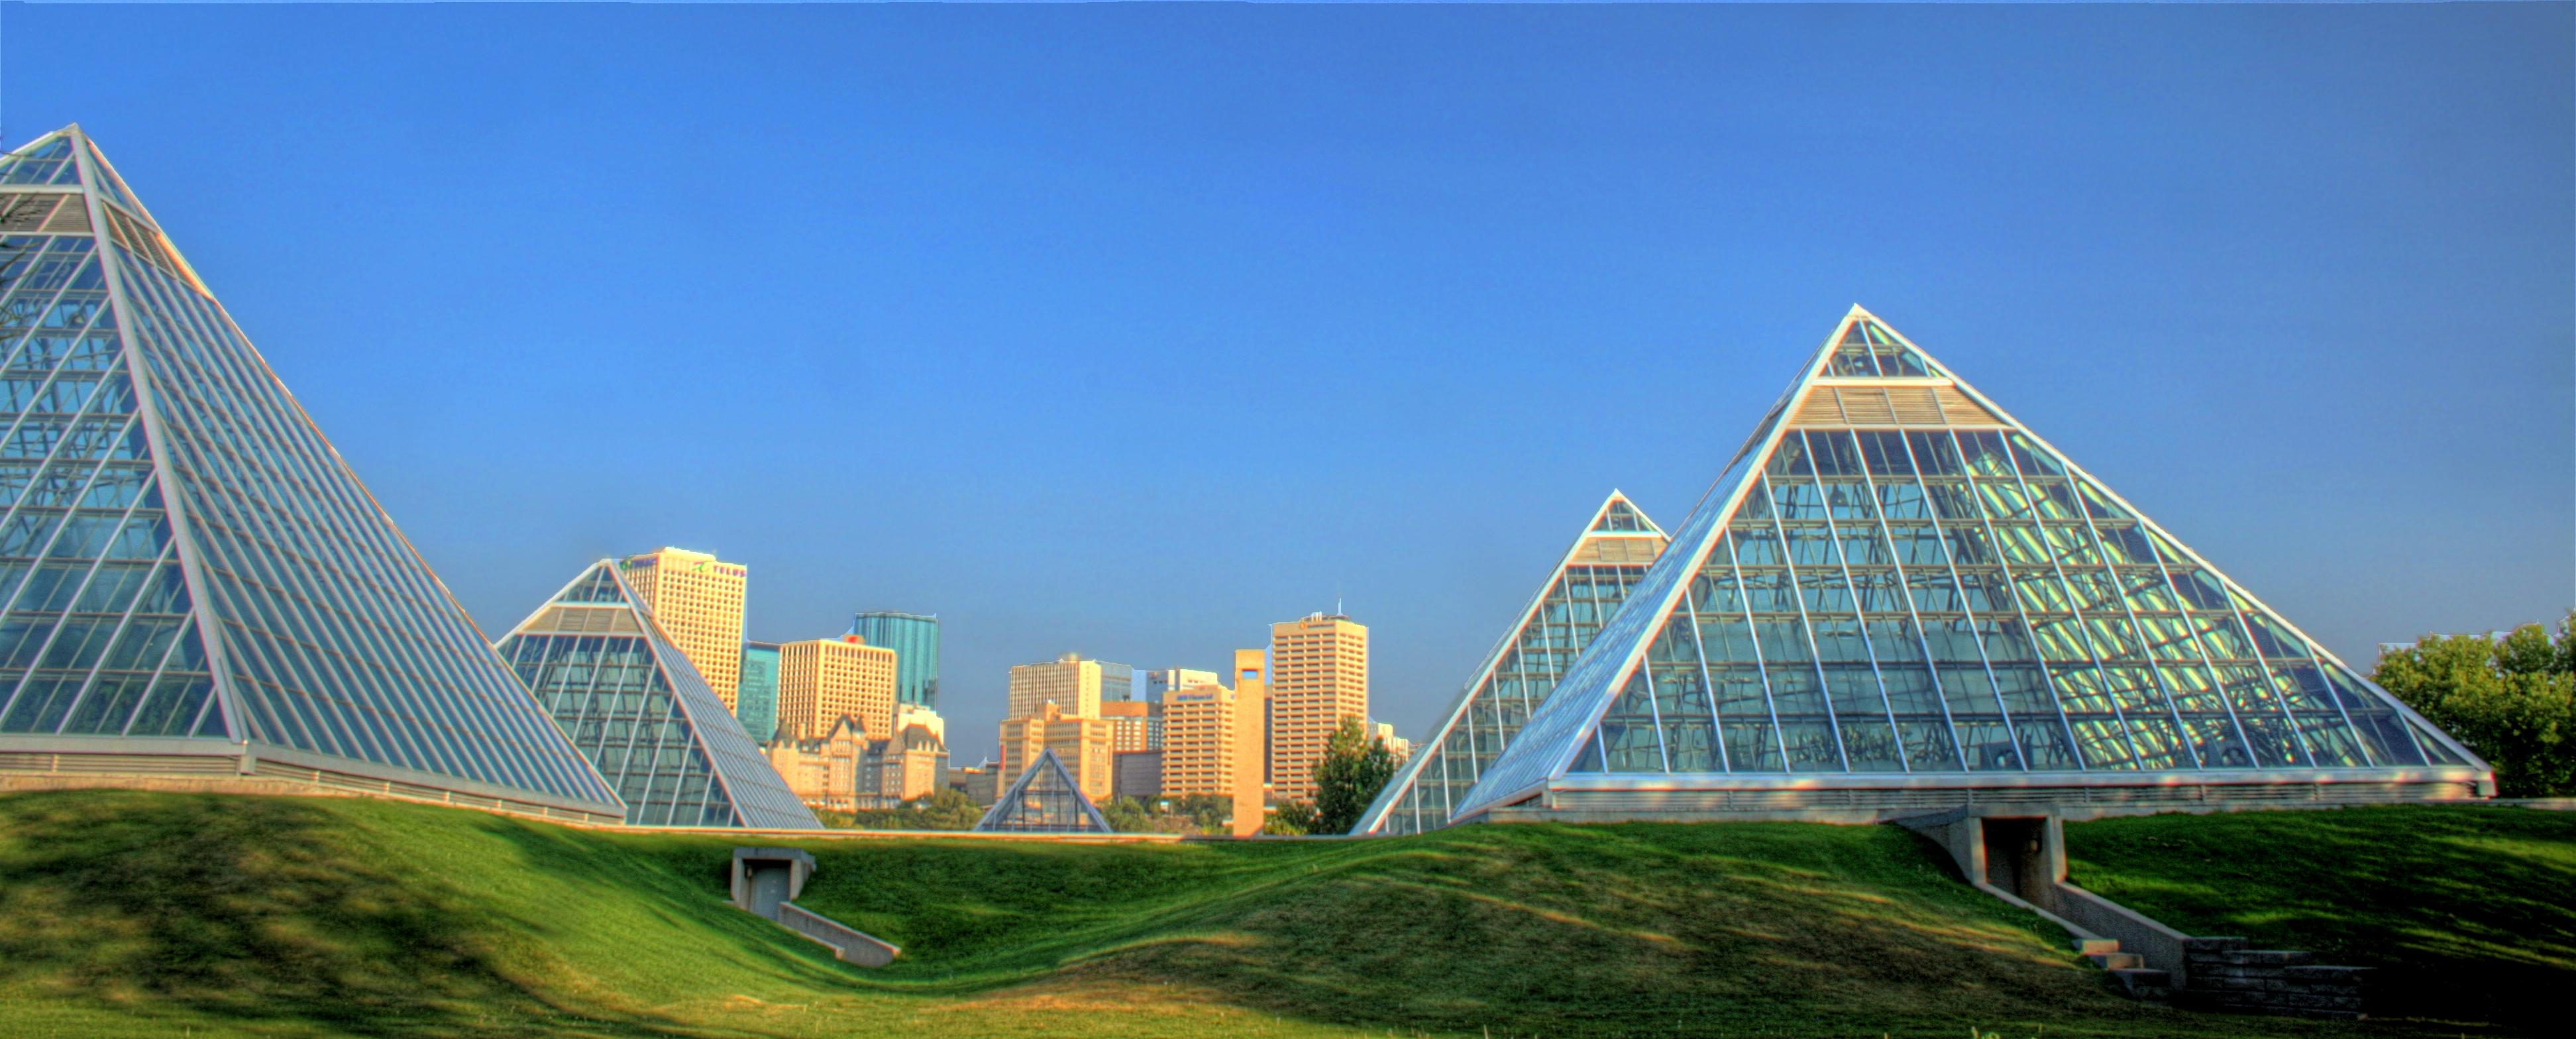 Edmonton (AB) Canada  city photos : Description Muttart Conservatories Edmonton Alberta Canada 20A